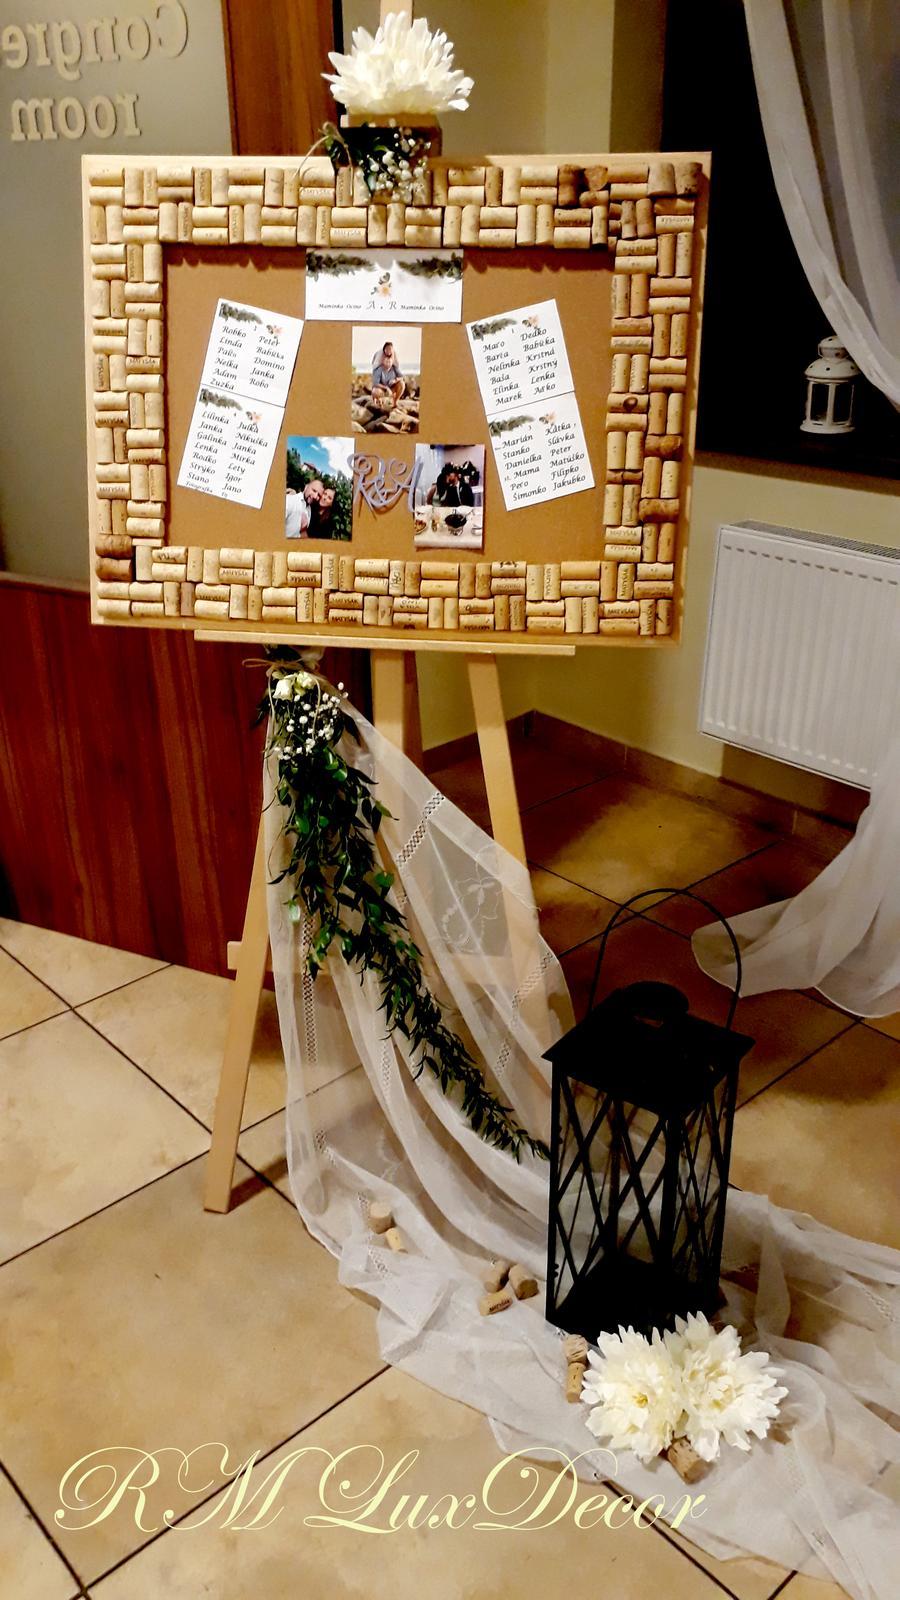 Svadba 13.10.2018 - Pezinok - Obrázok č. 7